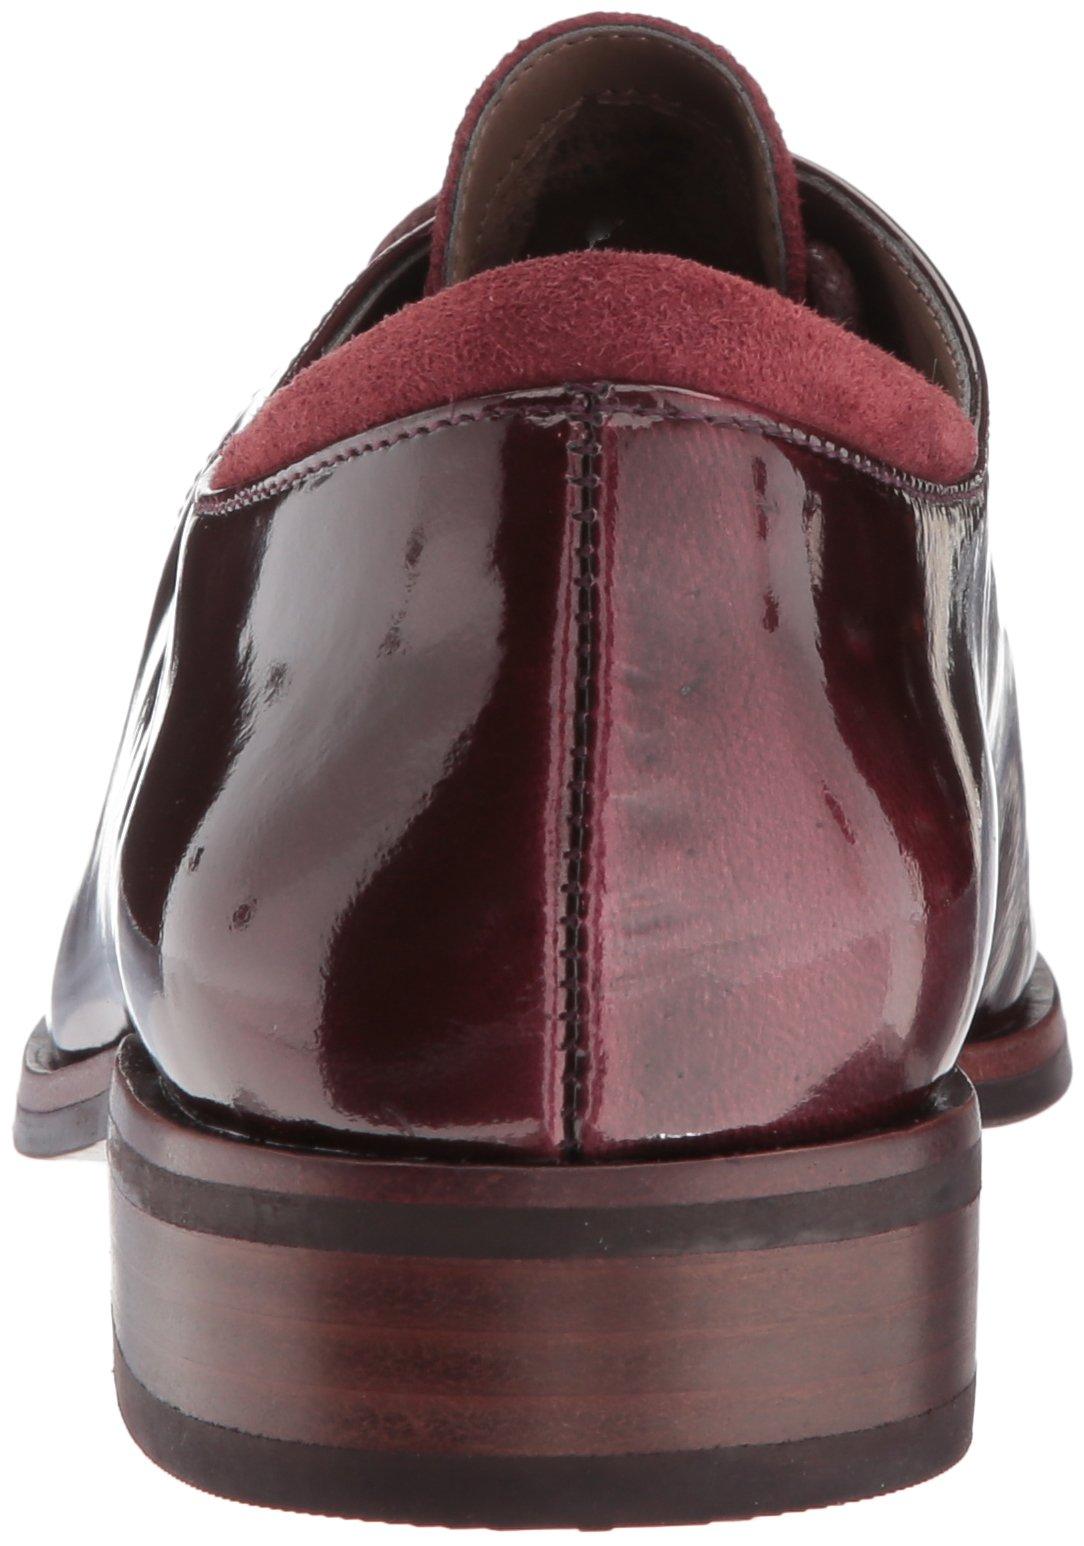 Aerosoles Women's East Village Oxford, Wine Leather, 9 M US by Aerosoles (Image #2)